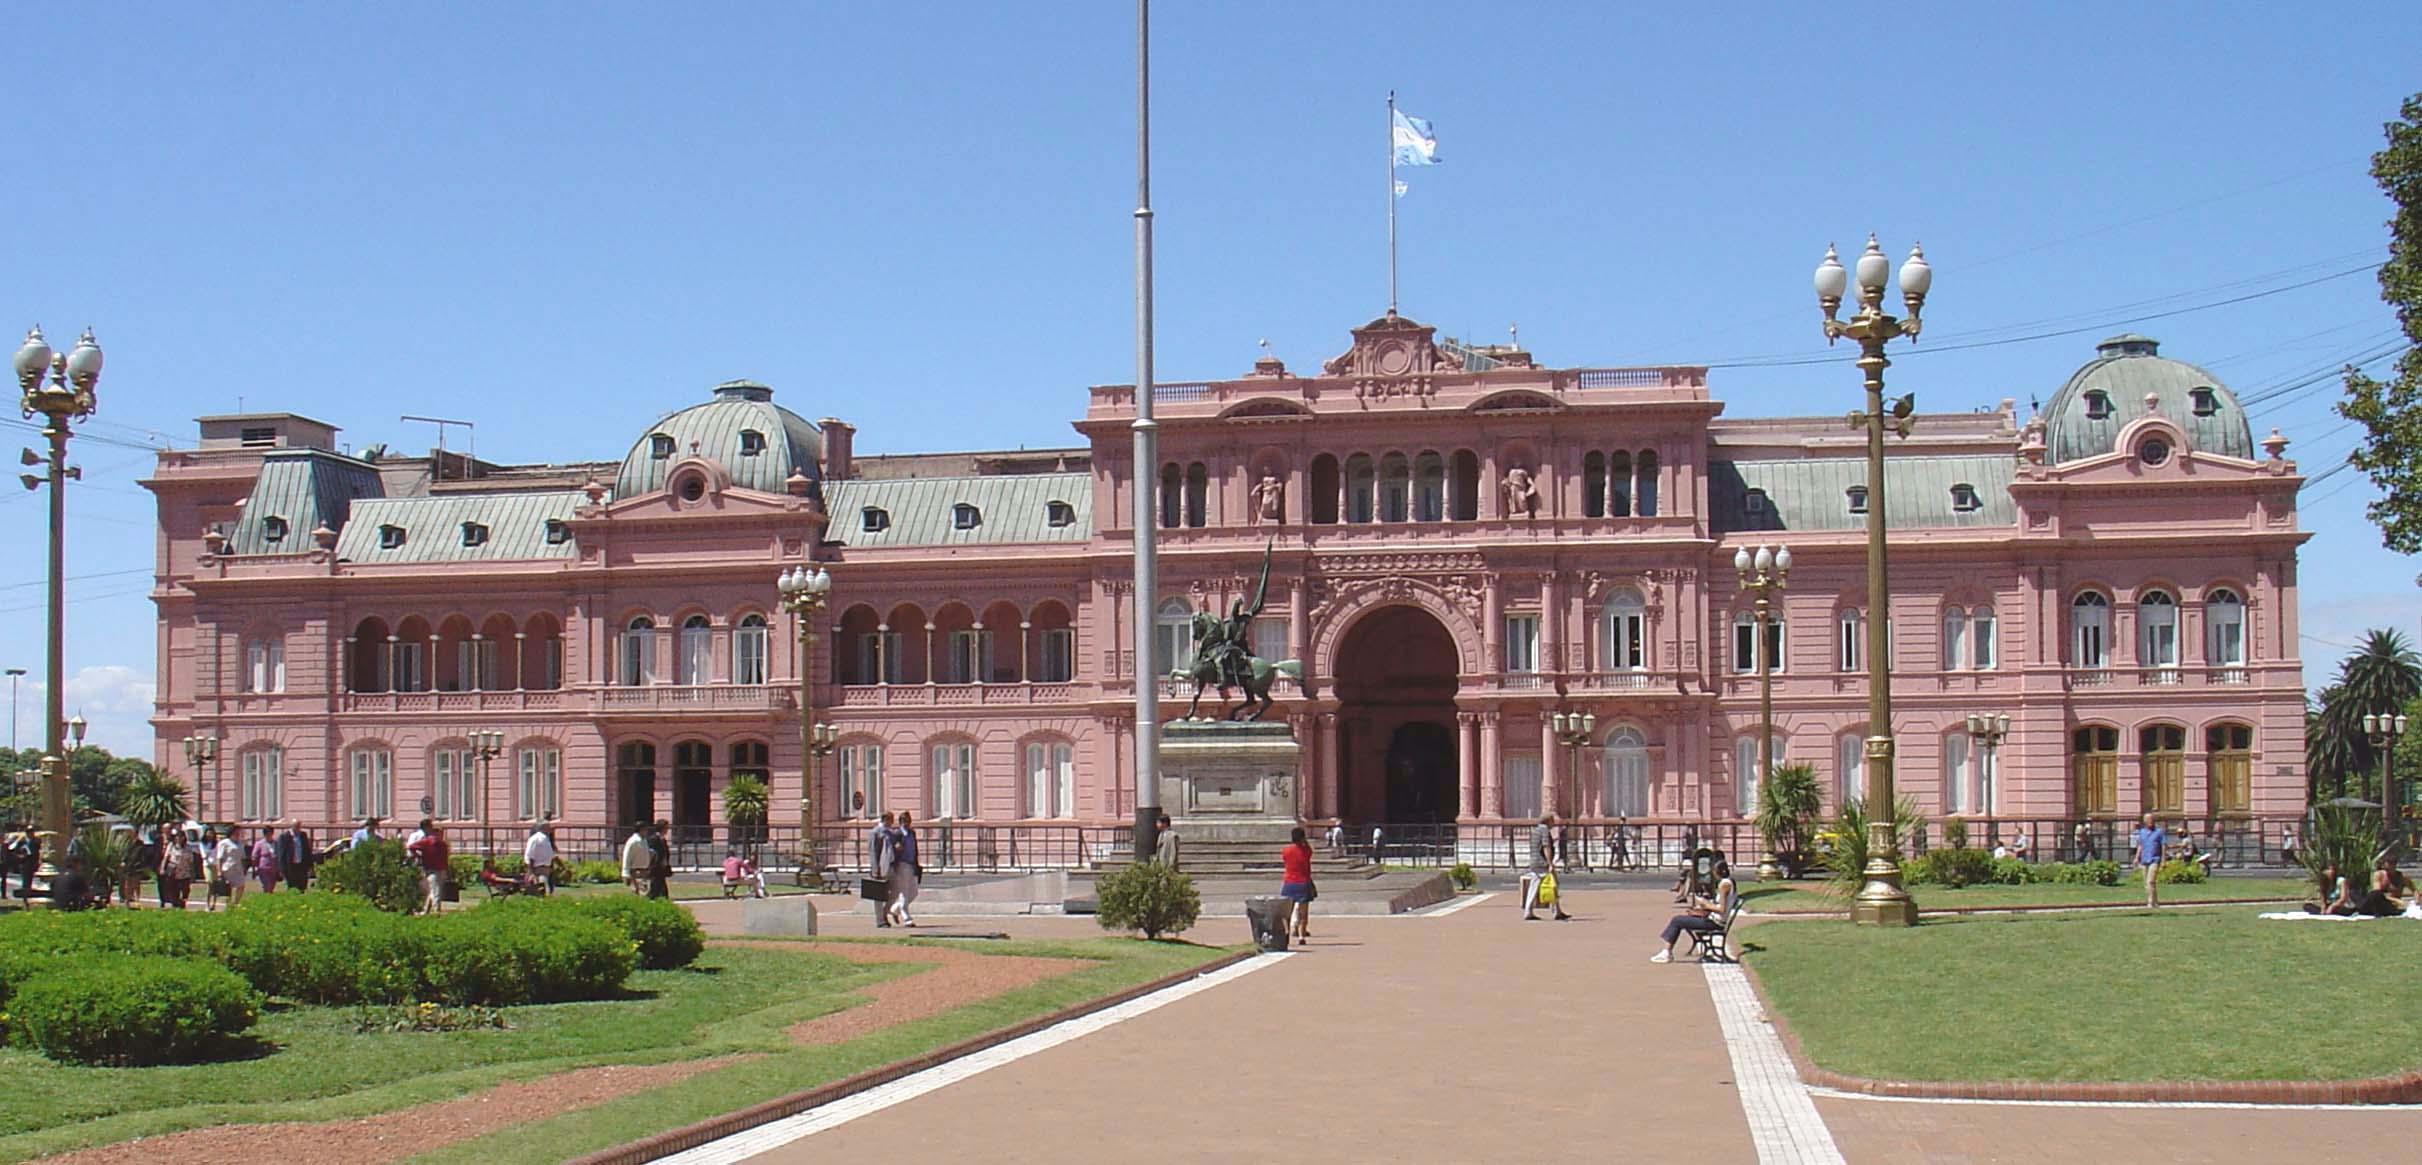 Ultimato rosa mochileiro buenos aires for La casa rosa milano